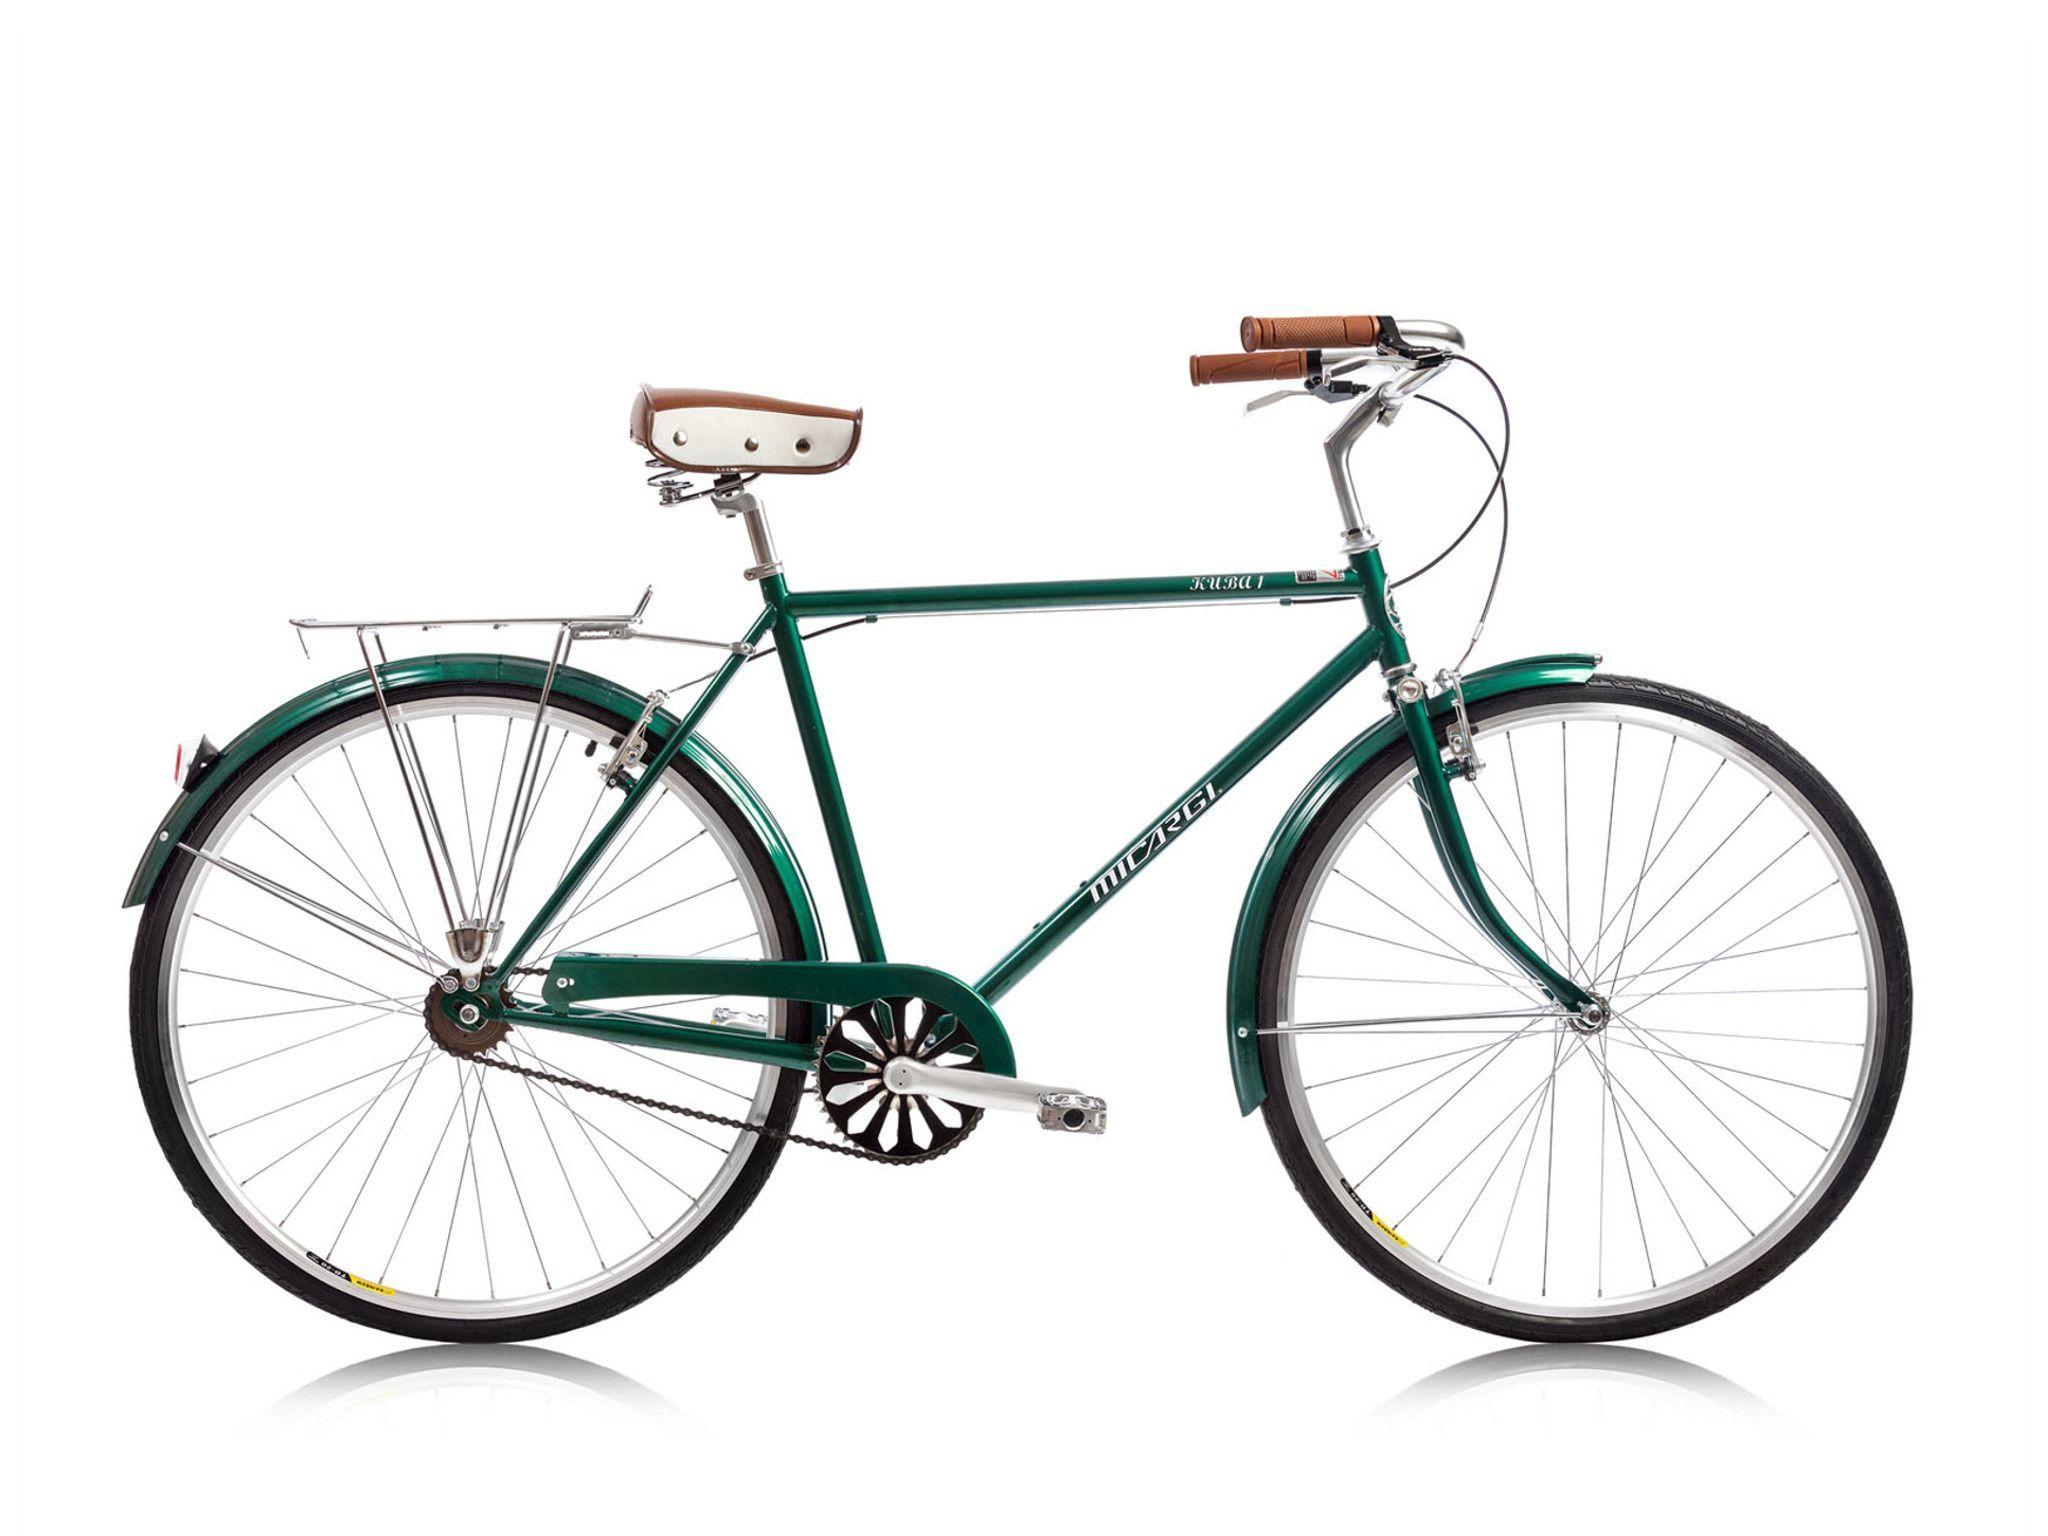 Micargi kuba 1 single speed city commuter bike dark green vintage eur